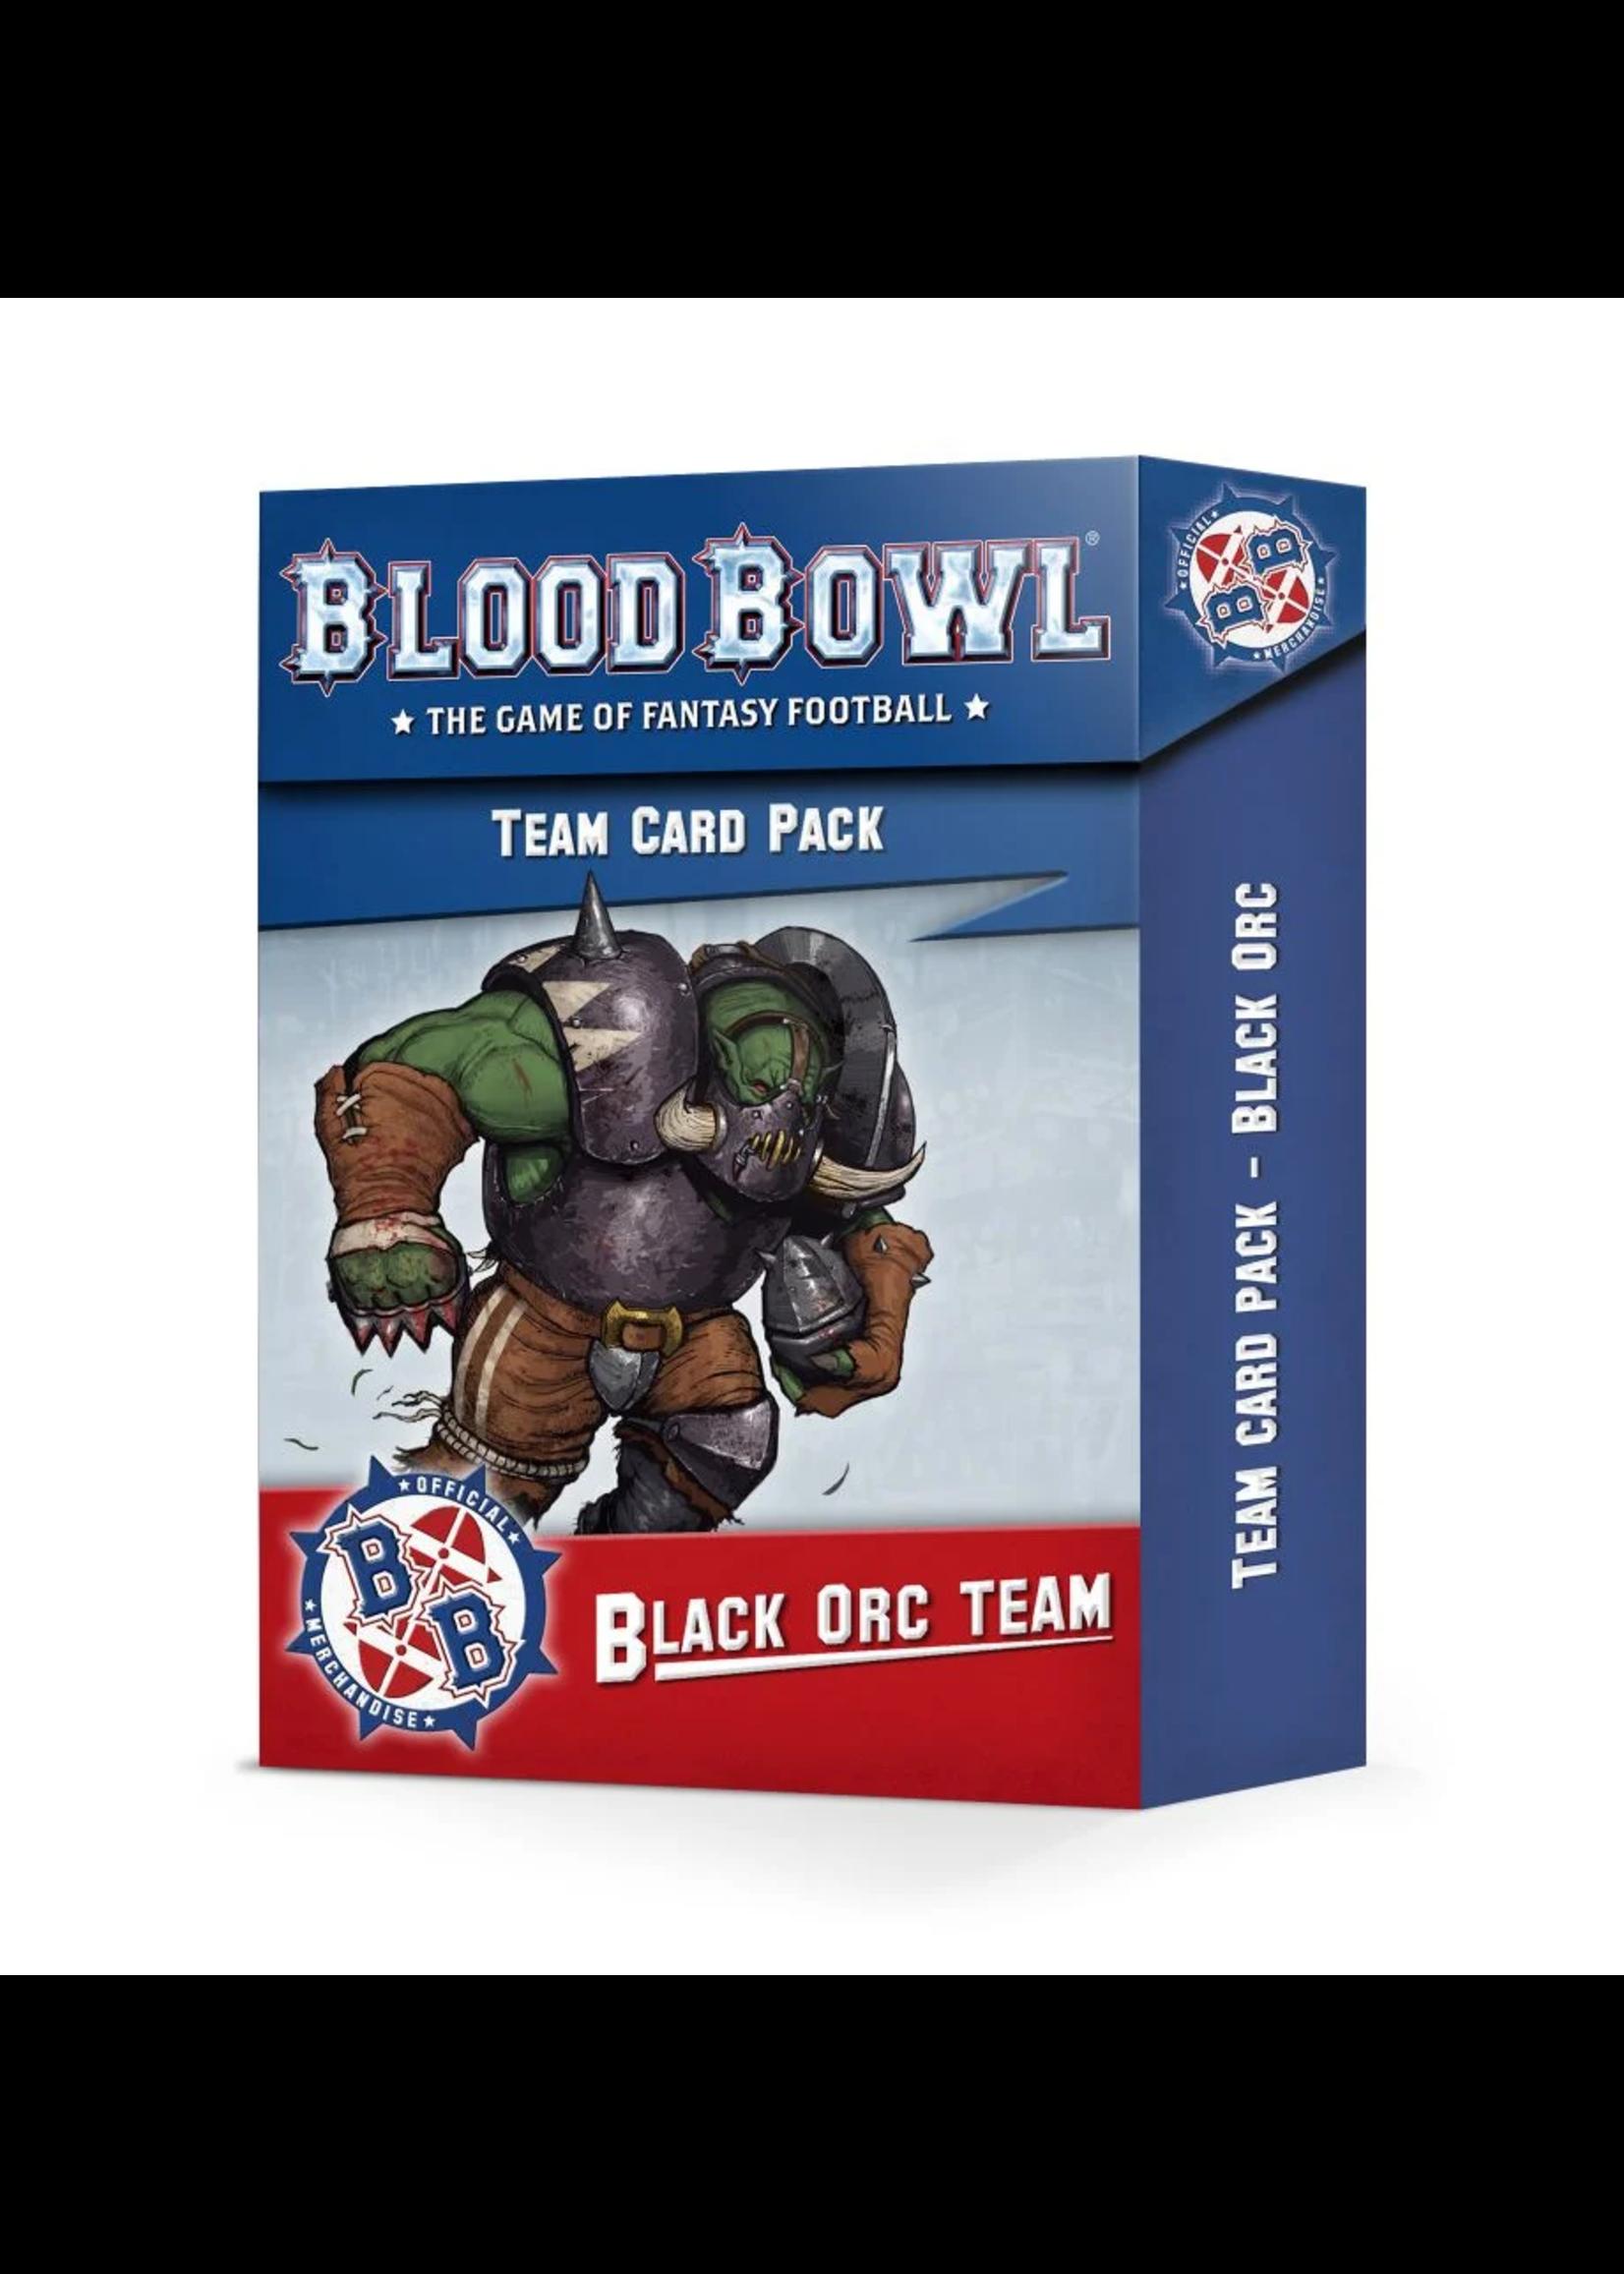 BLOOD BOWL: BLACK ORC TEAM CARD PACK (200-93)